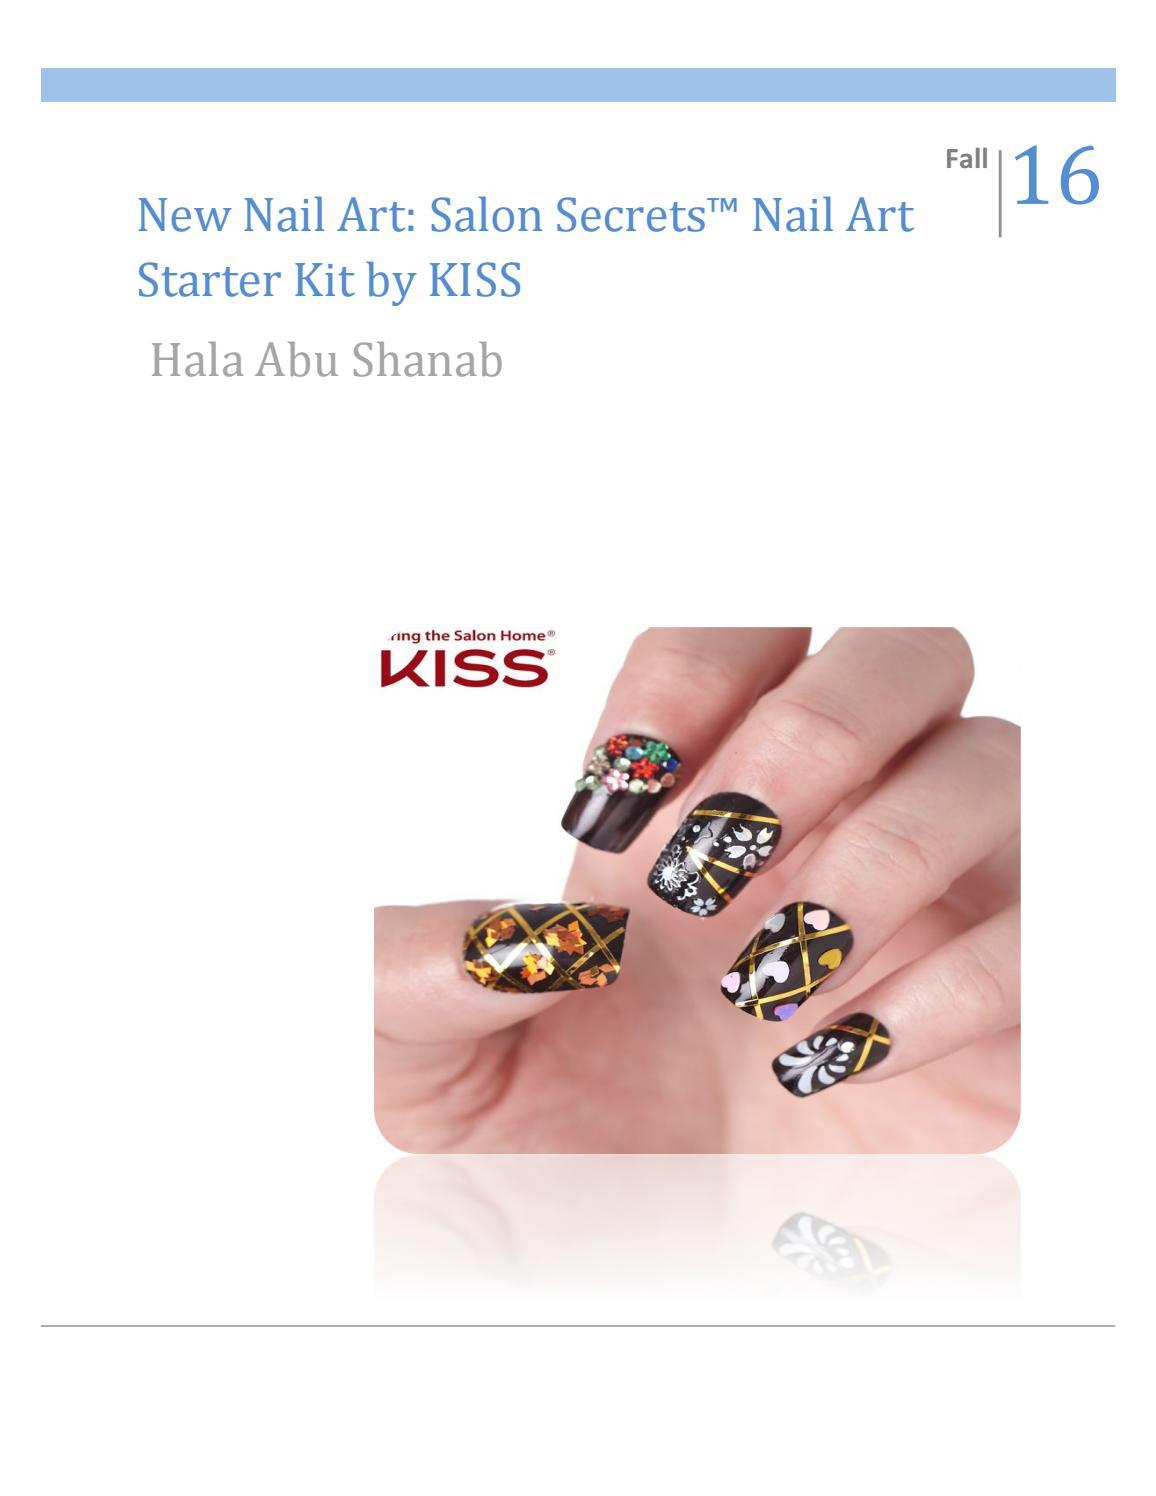 Brand Management: New nail art, Kiss by Hala Abu shanab - issuu